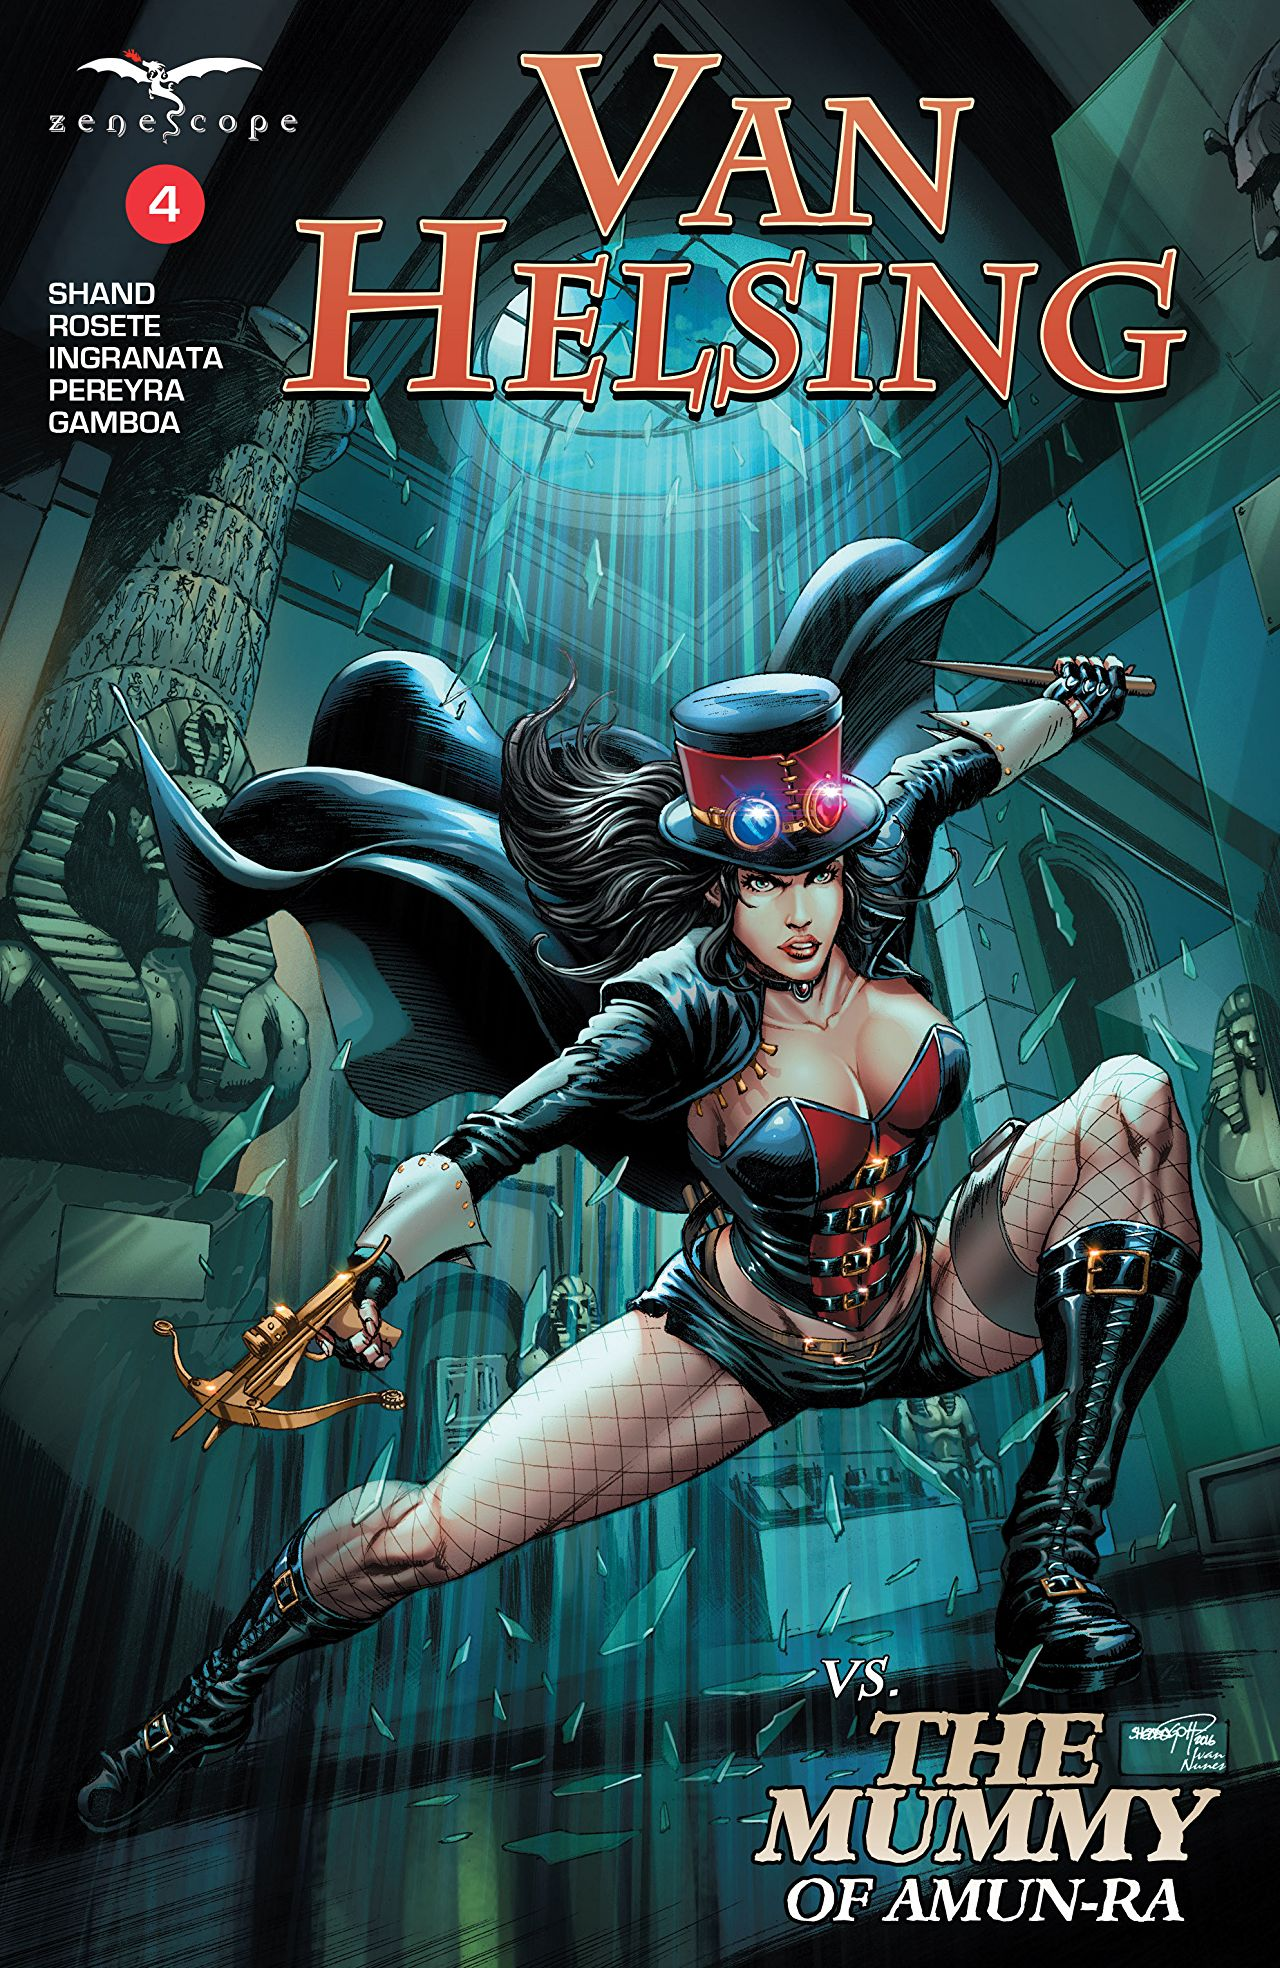 Van Helsing vs. The Mummy of Amun-Ra #4 - Comics by comiXology